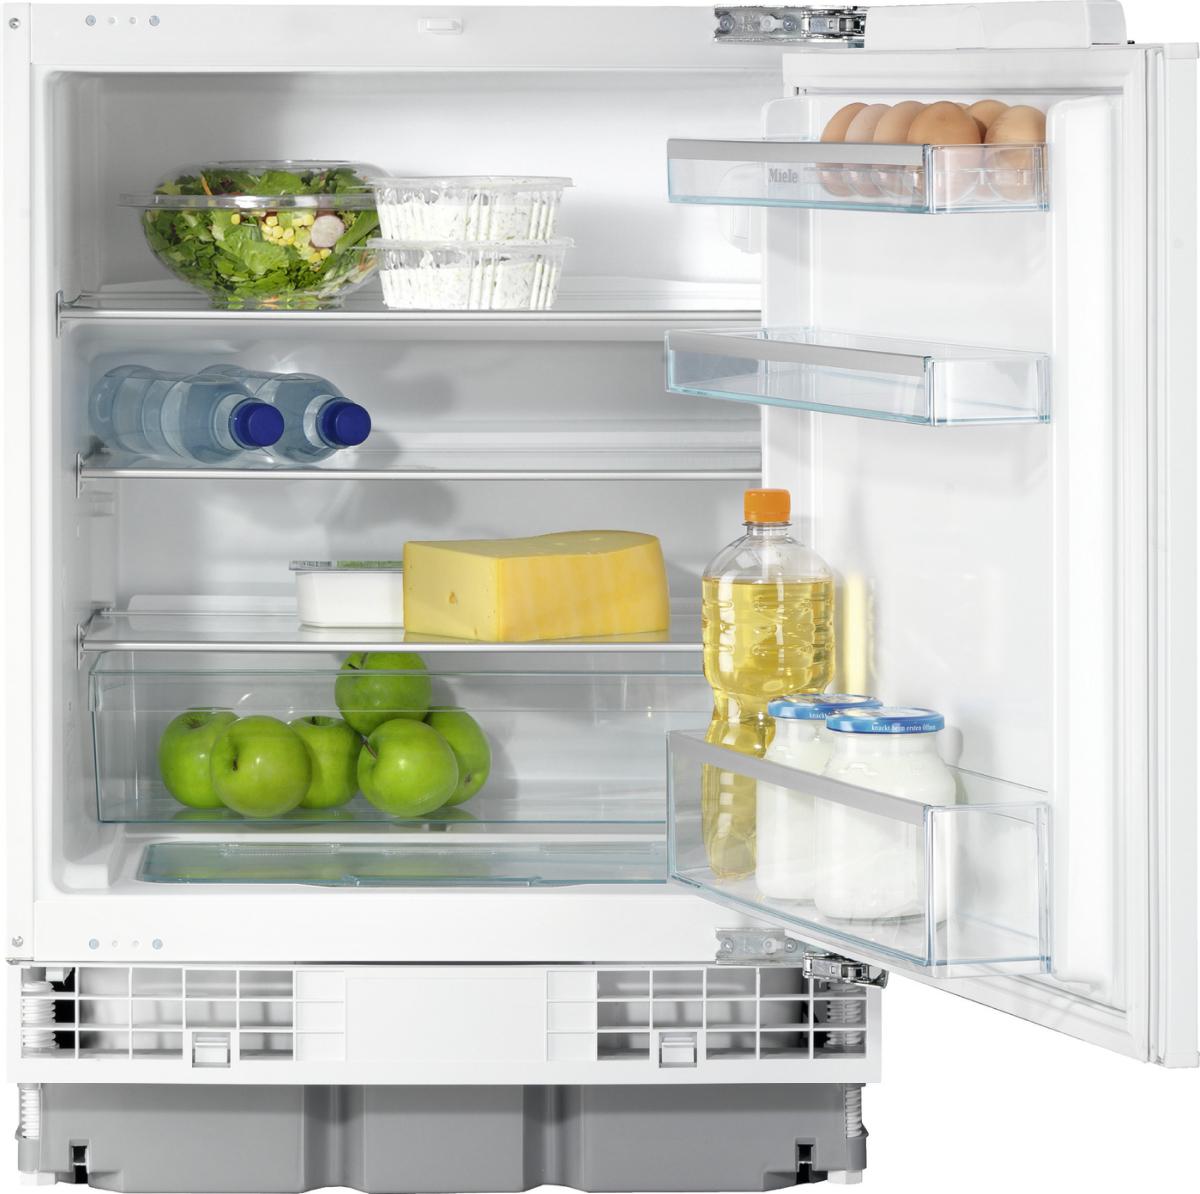 Miele K 5122 Ui Einbau-Kühlschrank